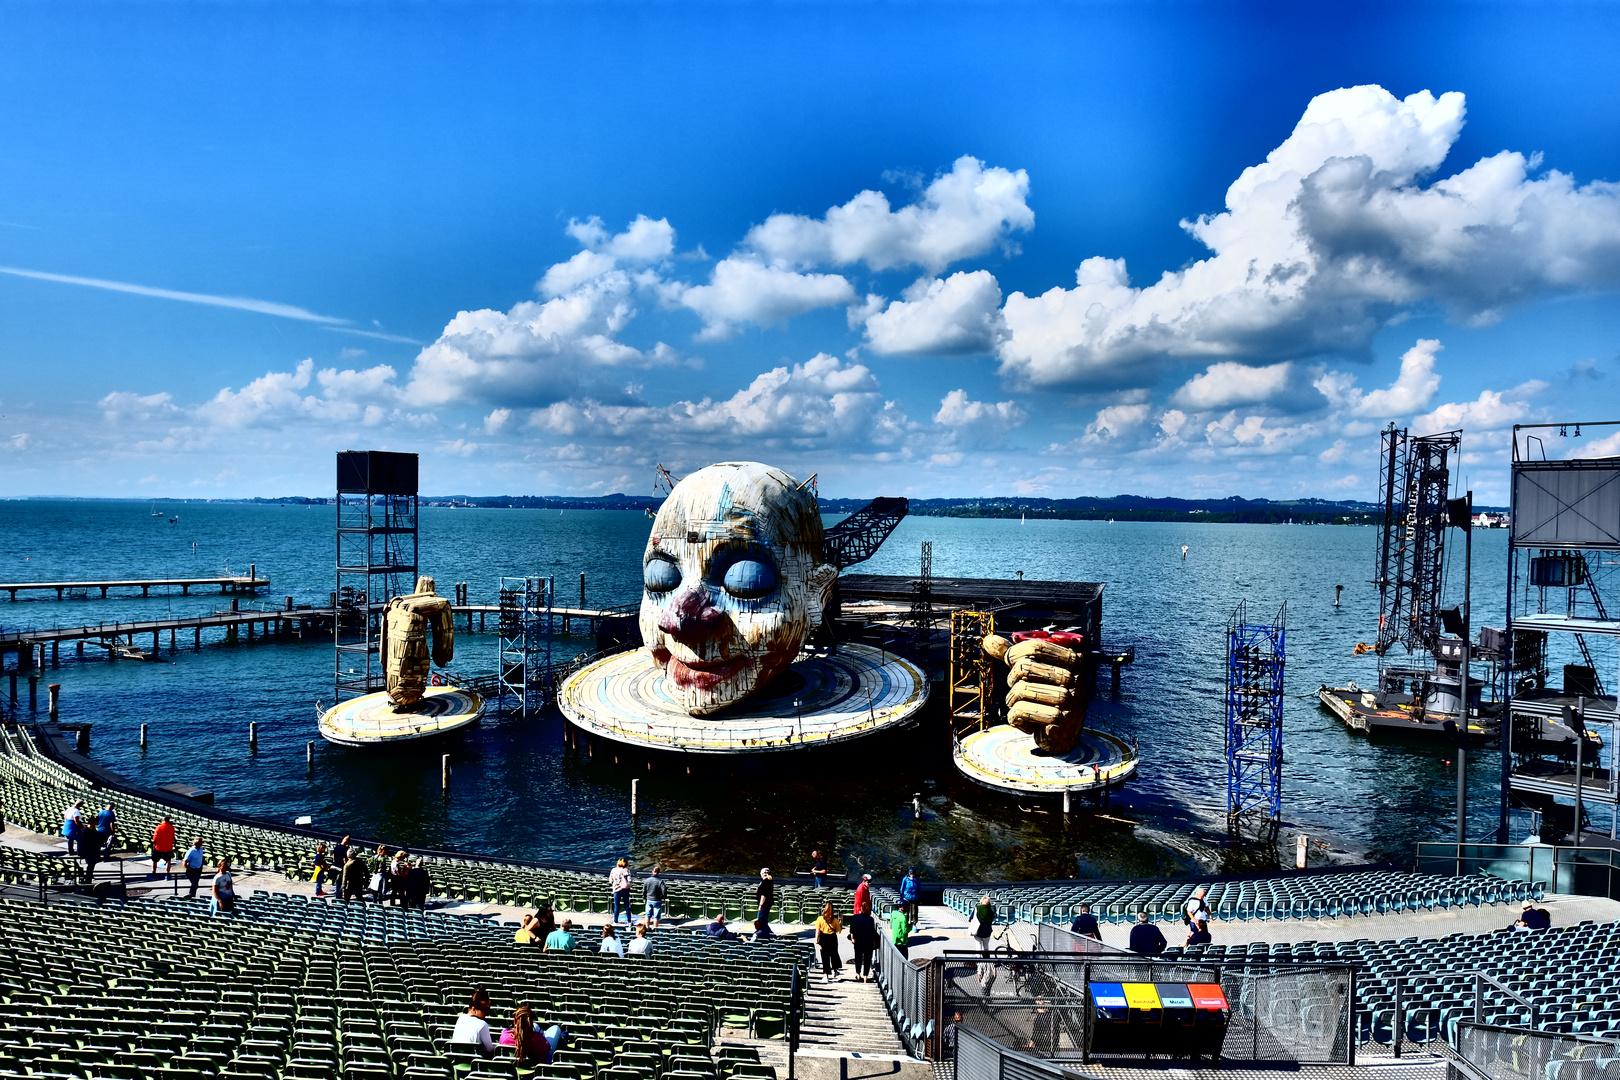 (3) Visite du lac de Constance: Le Festival de Bregenz: Rigoletto, de Giuseppe Verdi